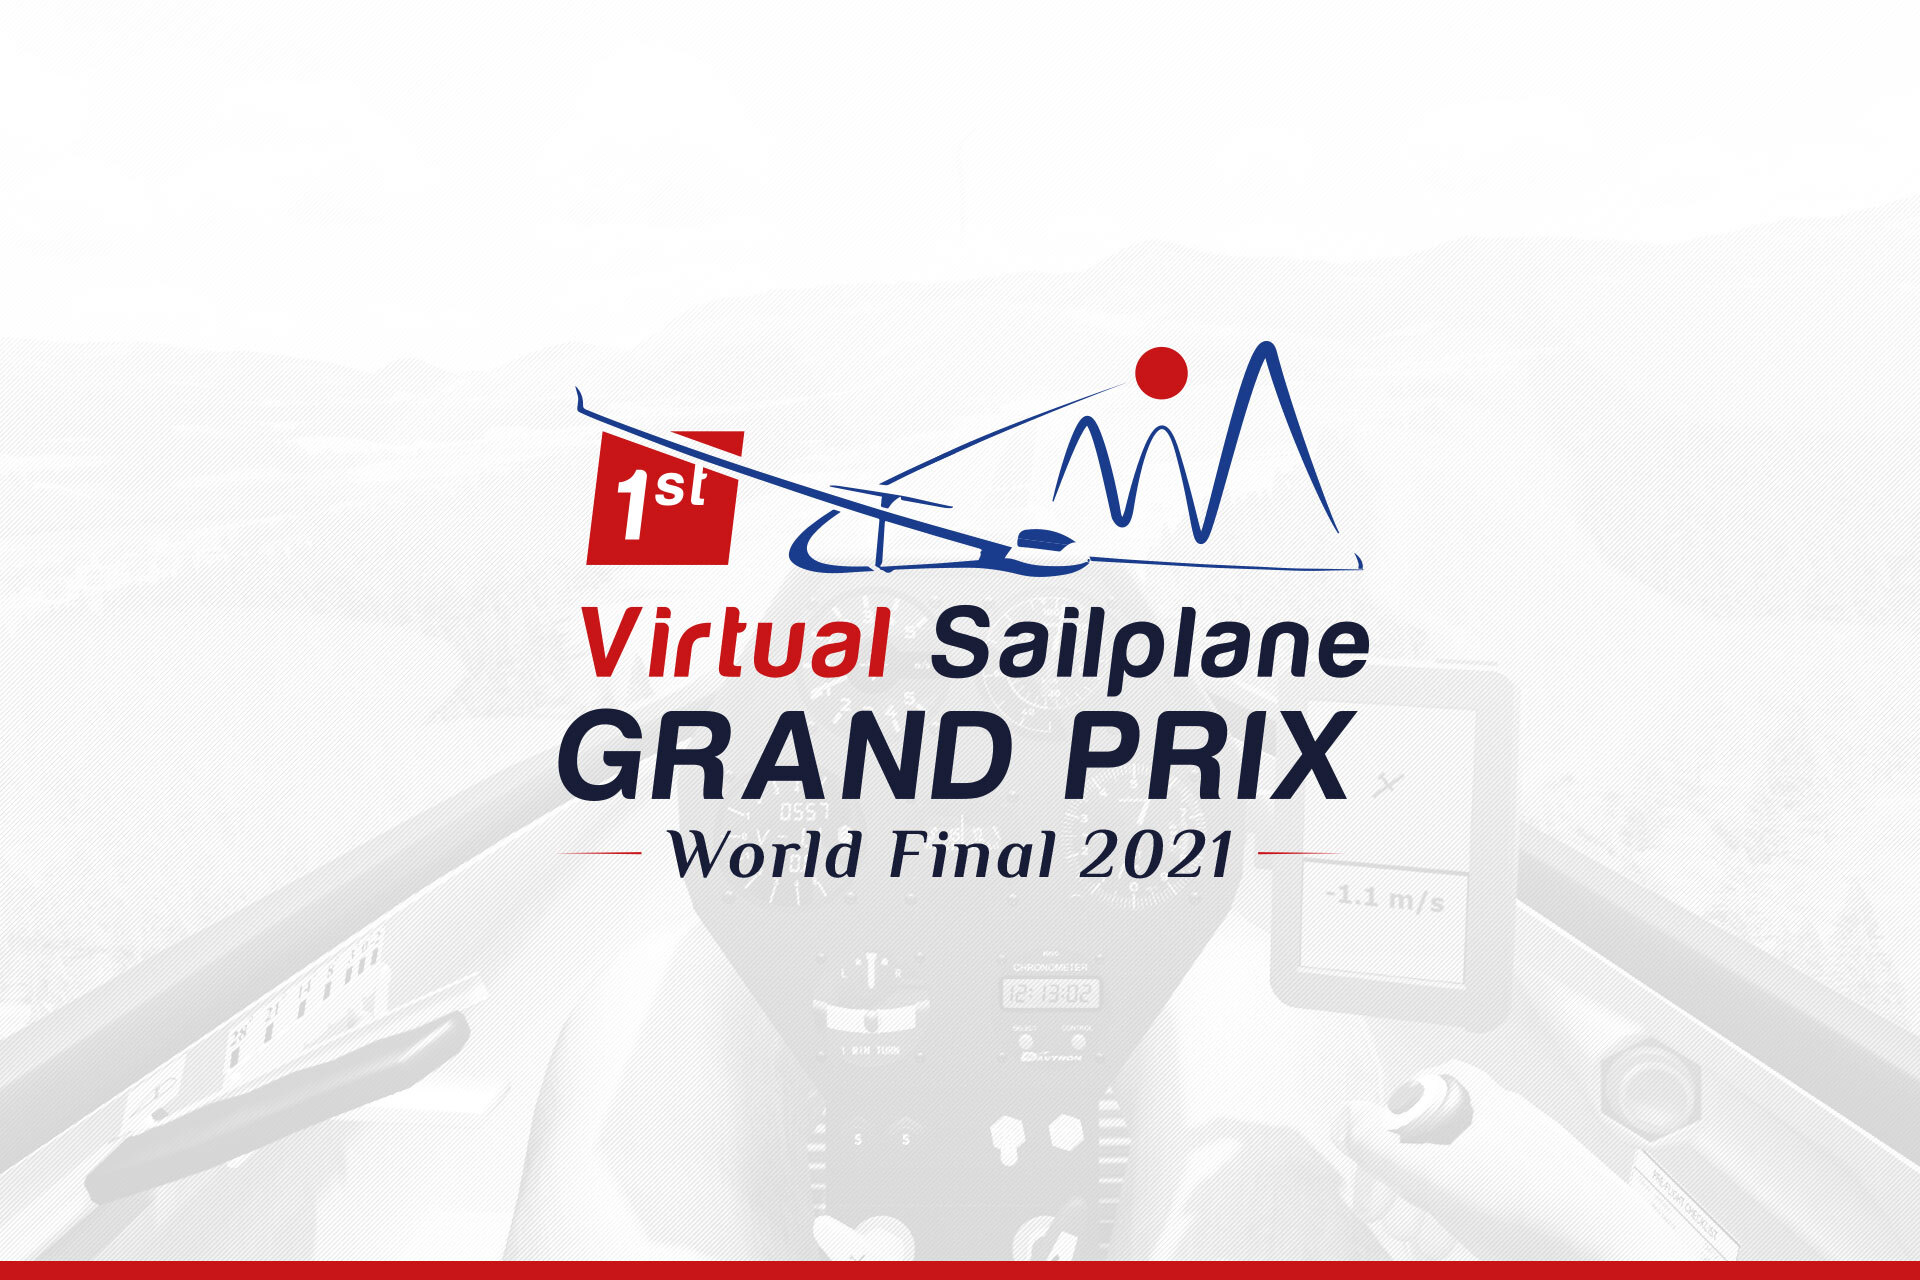 1st Virtual Sailplane Grand Prix – World Final 2021